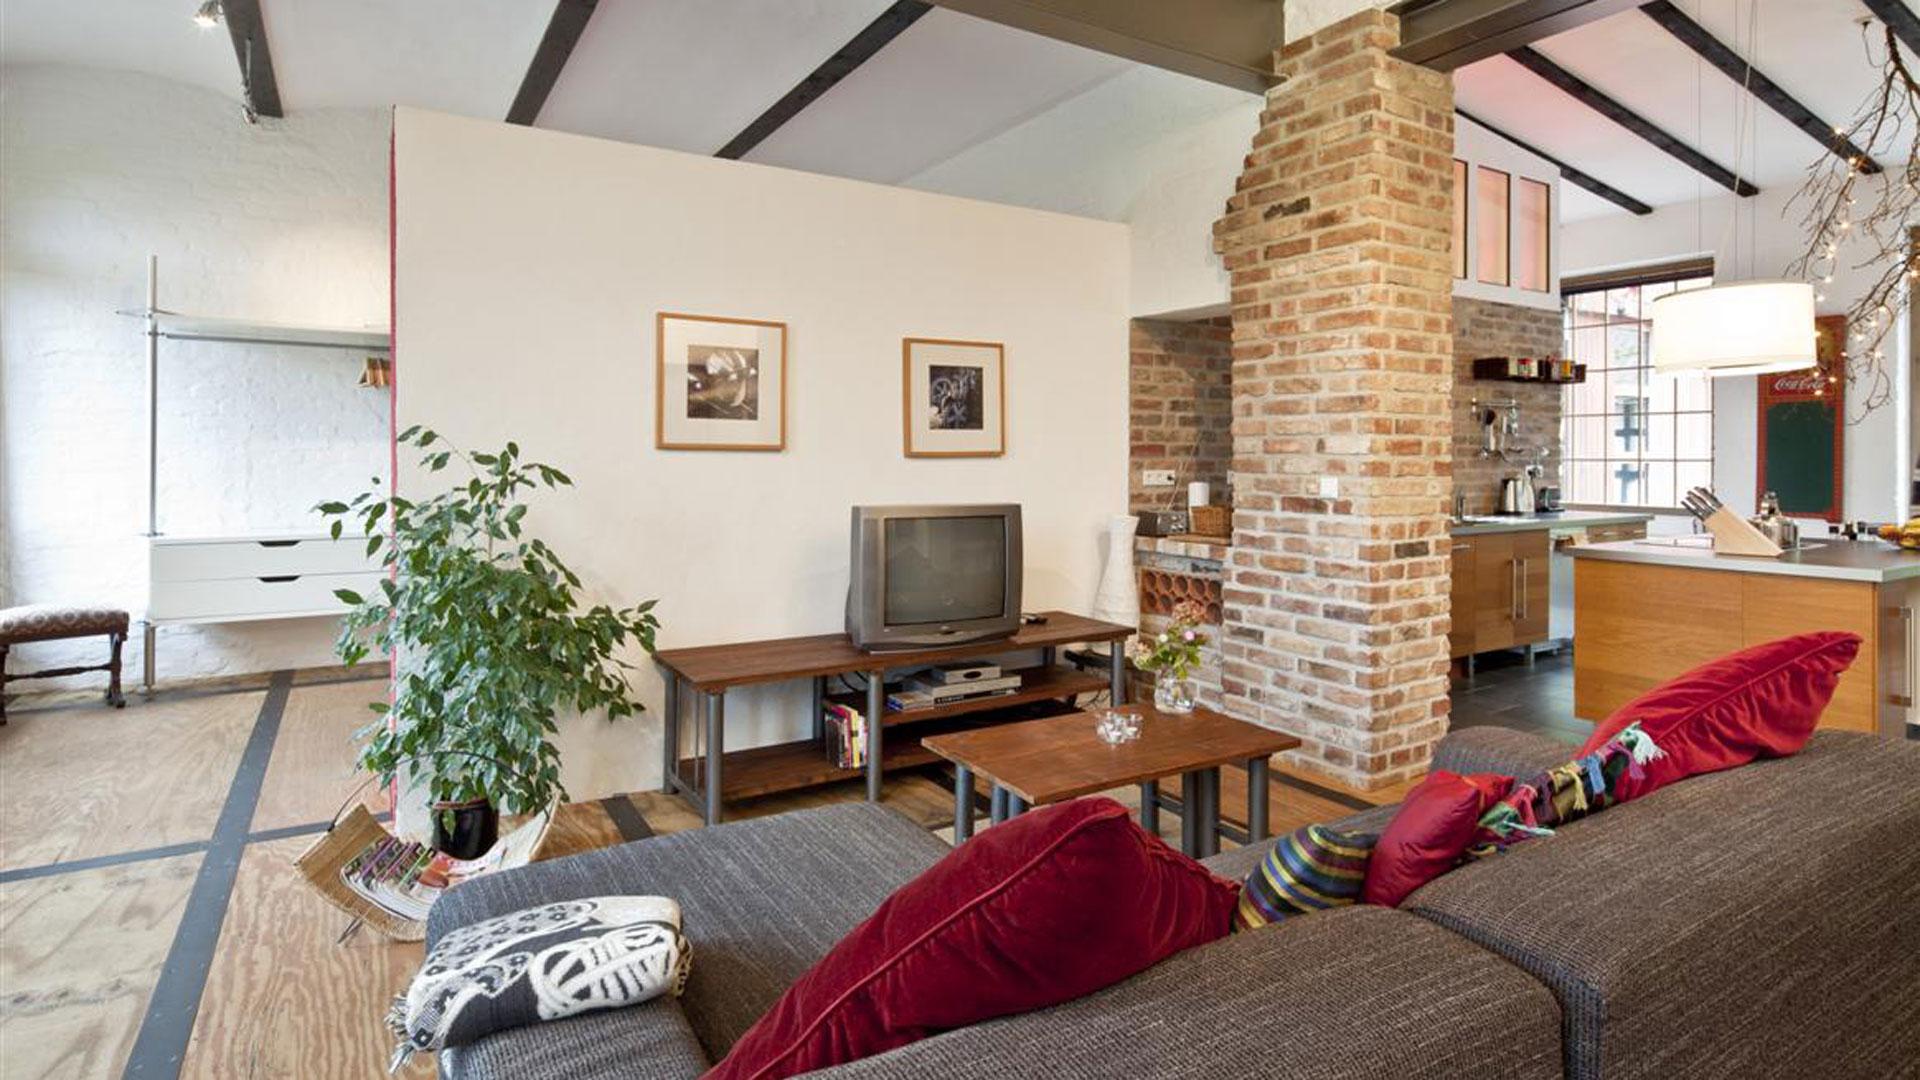 Loft, Wohnraum 3, Foto: Sonja Speck